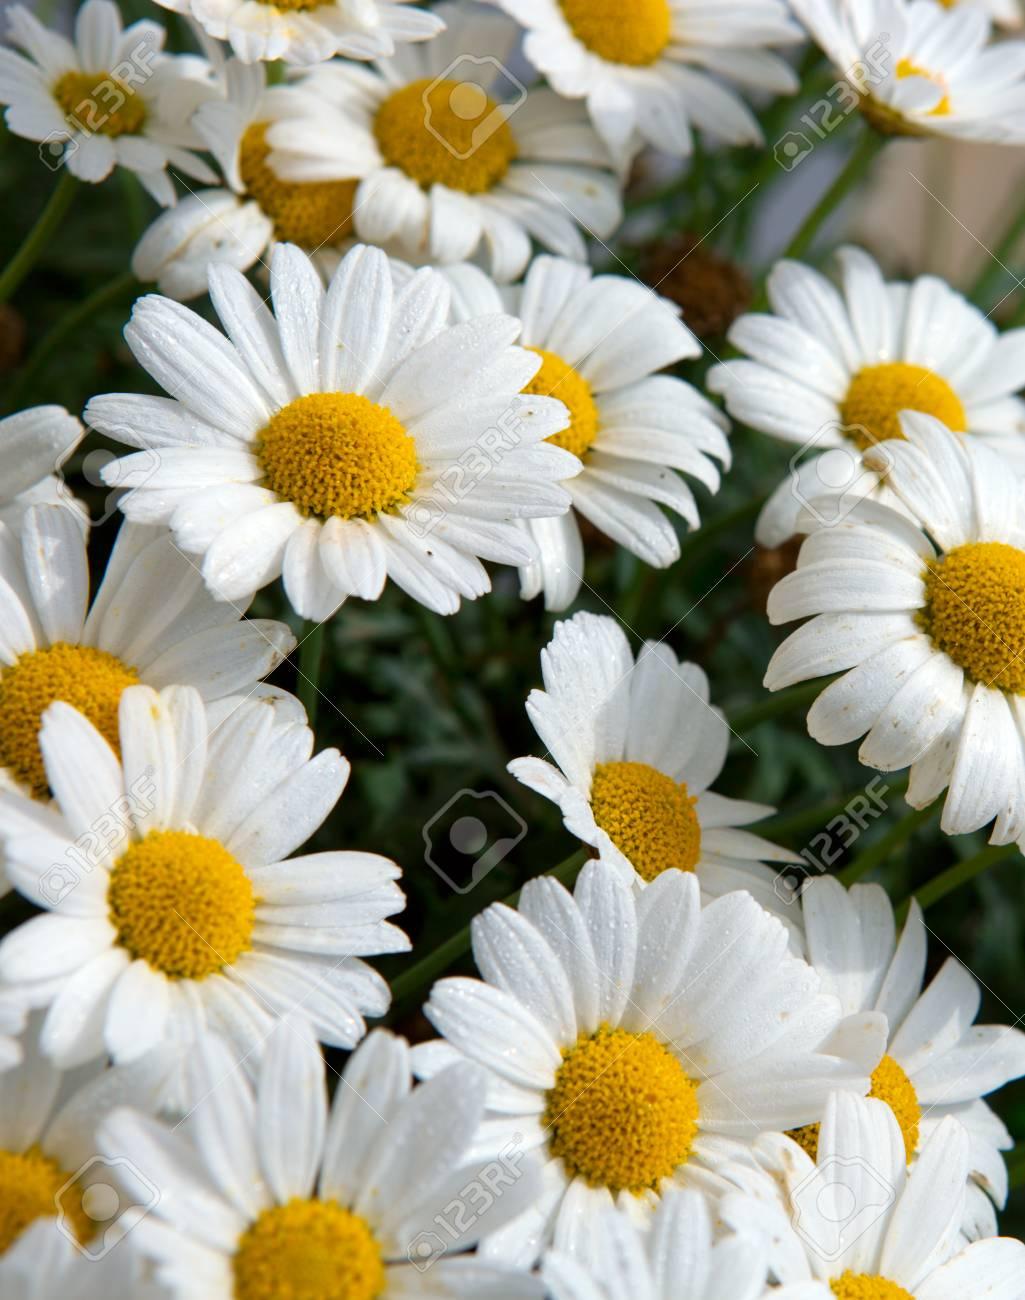 Daisy Flowers Backgroundmacro Of Beautiful White Daisies Flowers